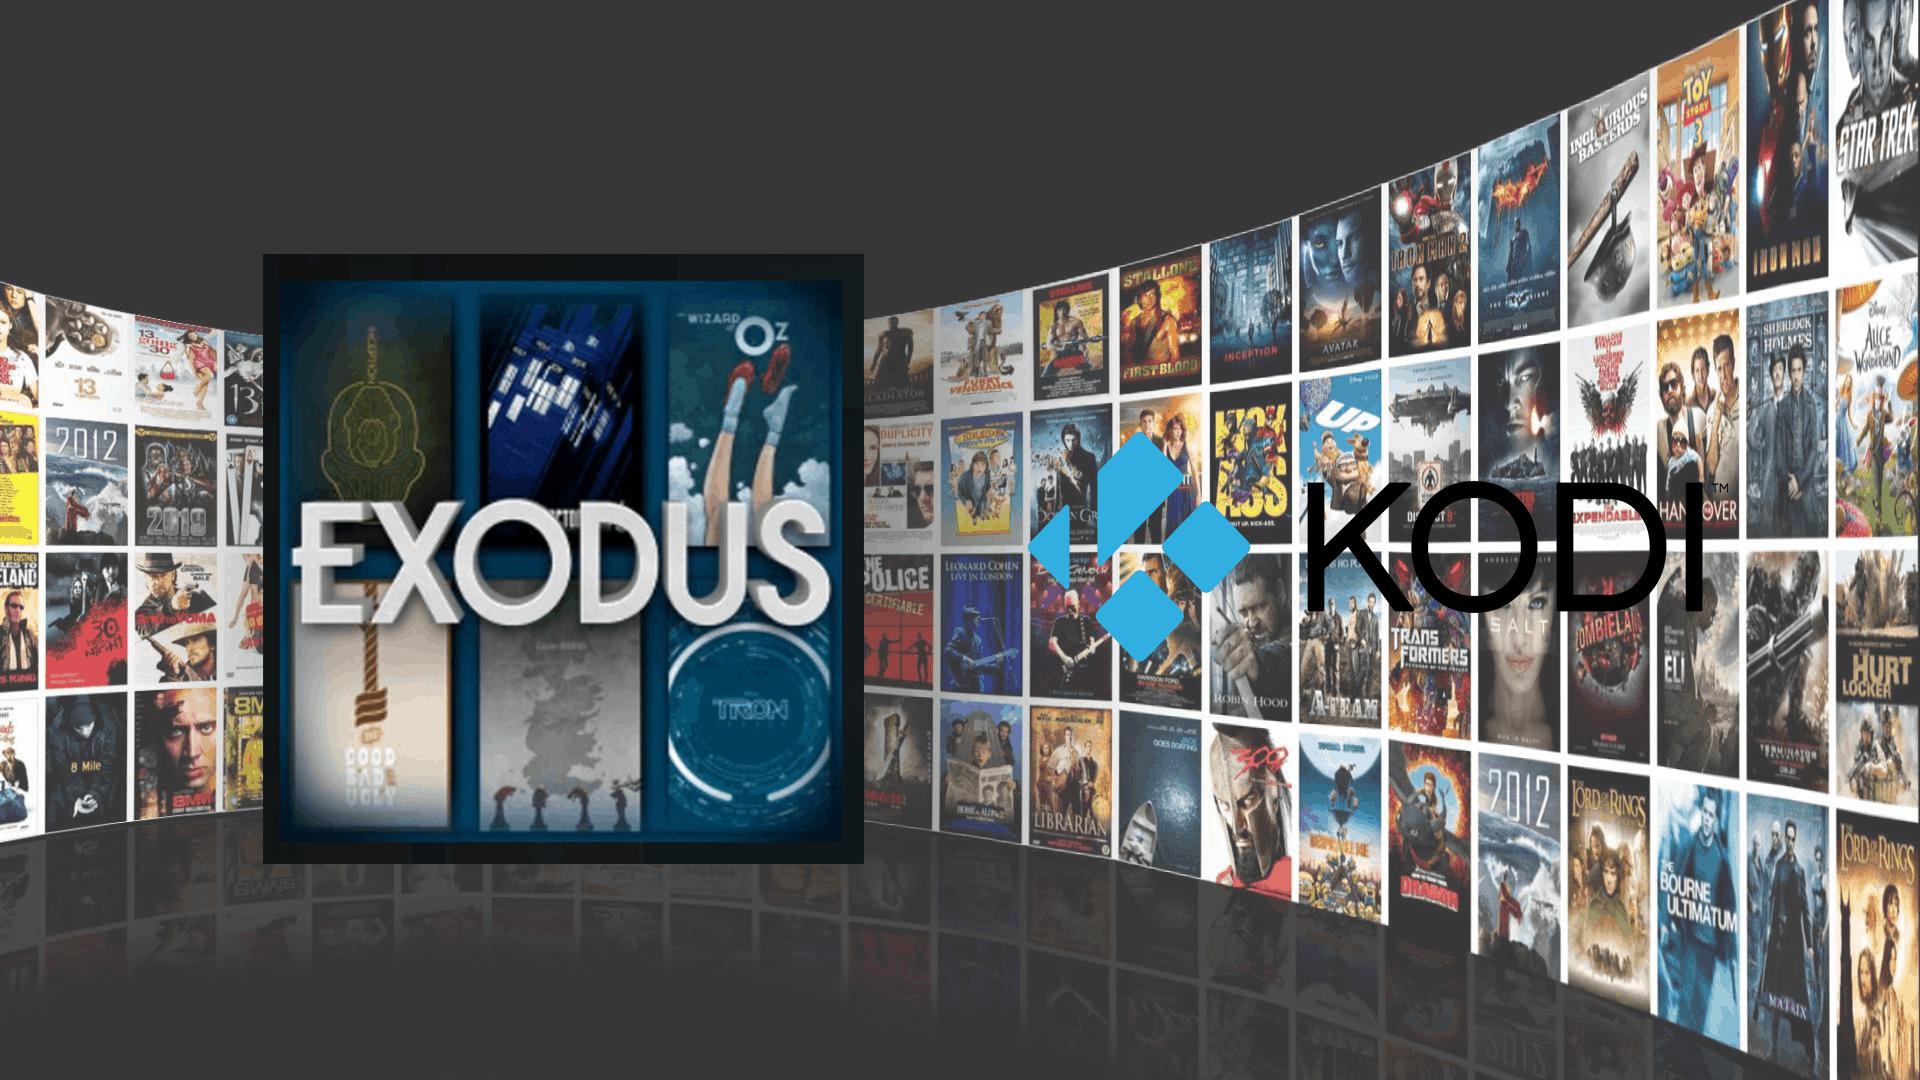 exodus kodi indian movies